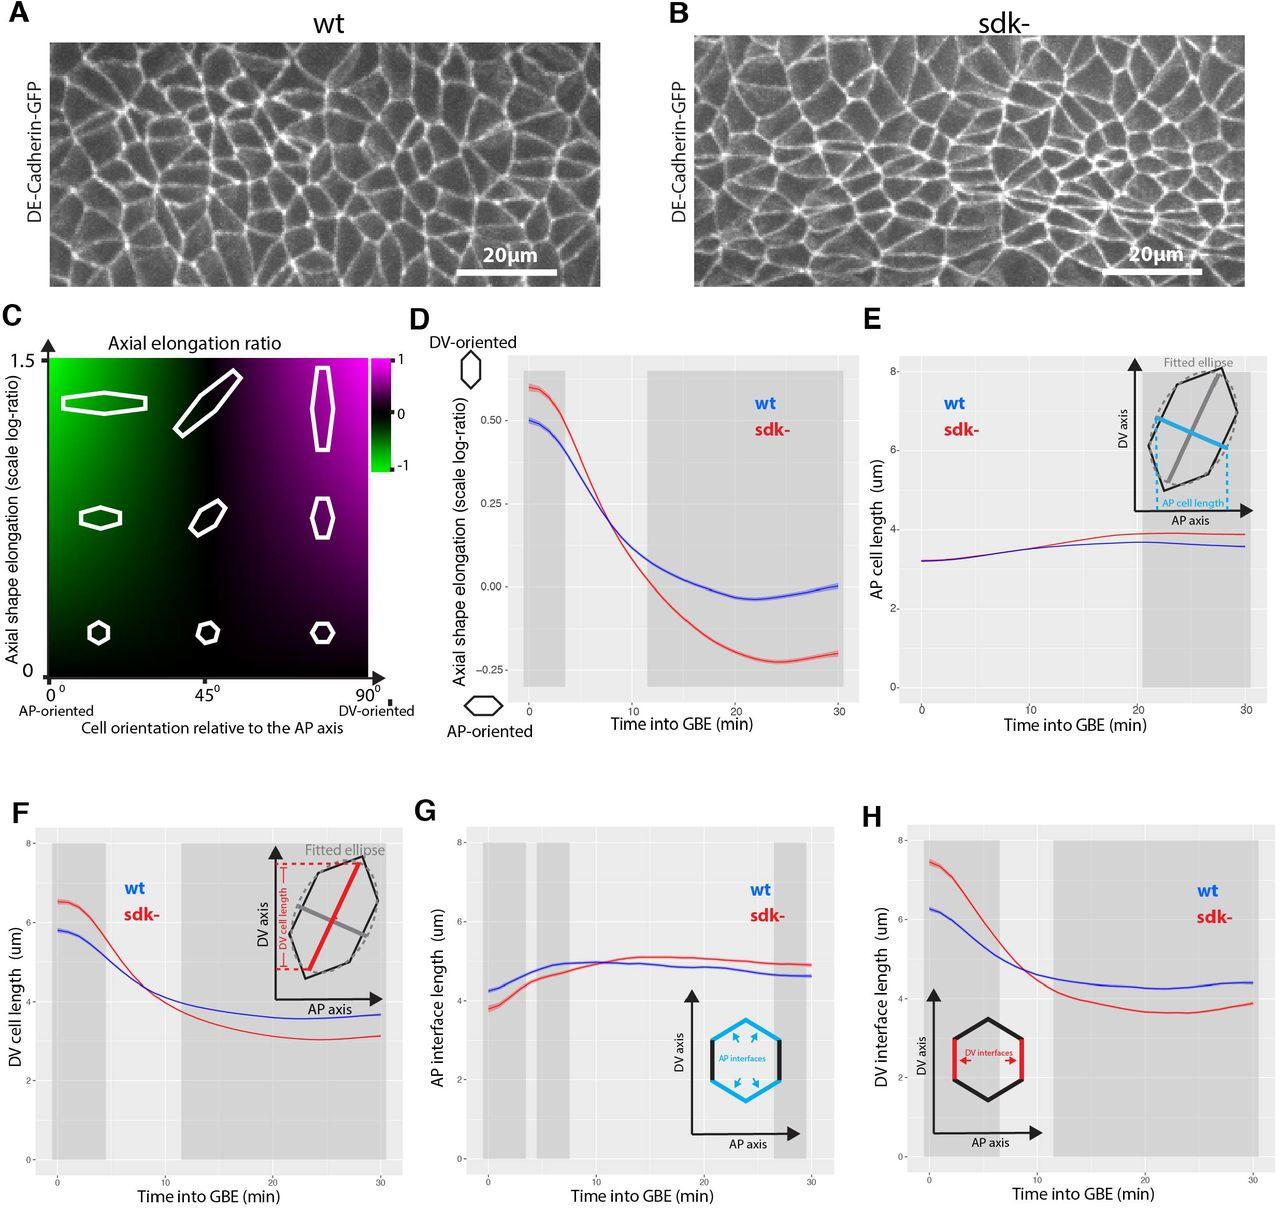 The tricellular vertex-specific adhesion molecule Sidekick